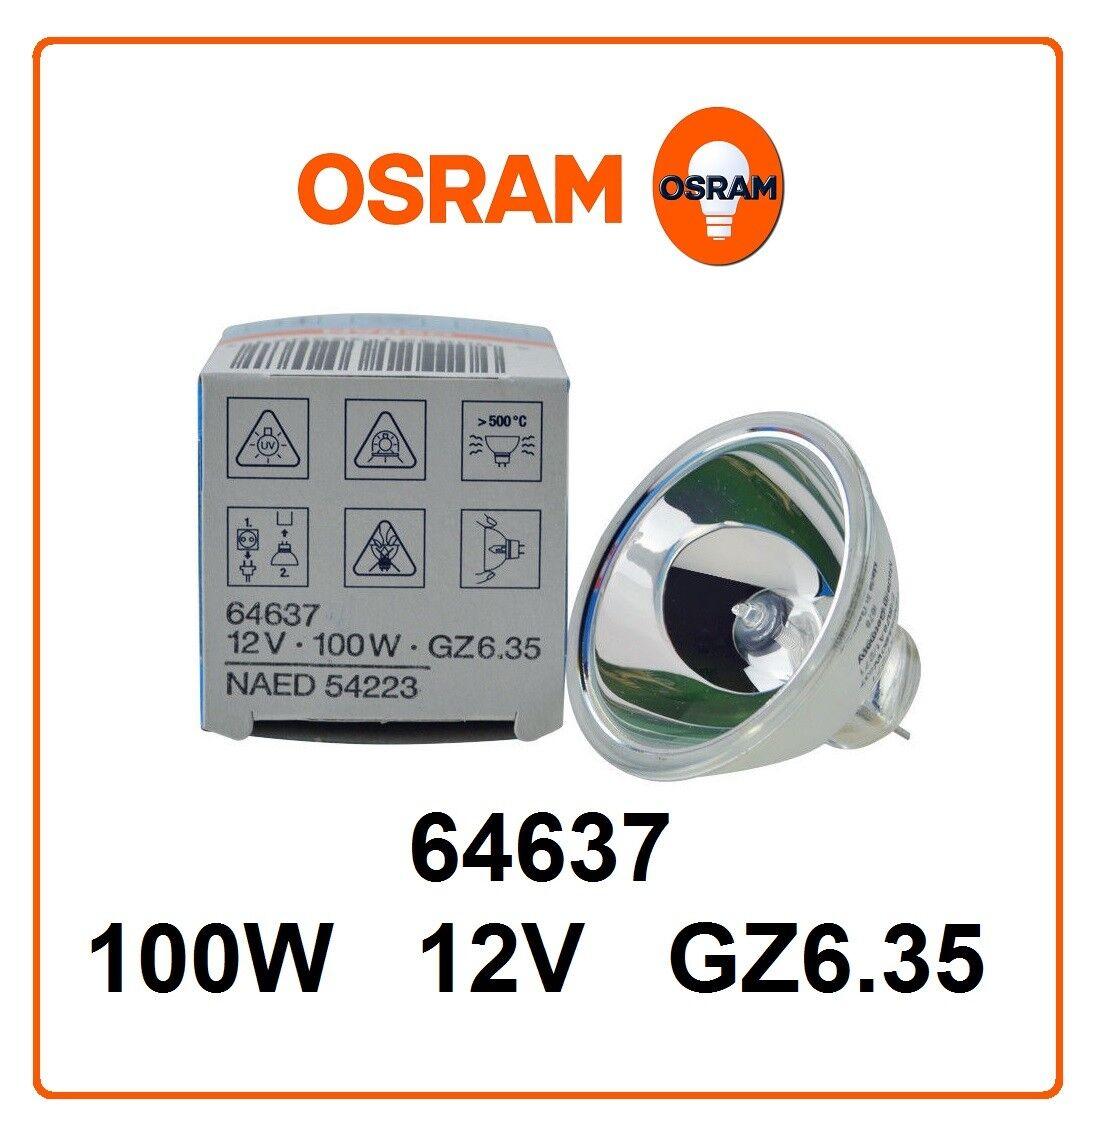 NEW OSRAM HALOGEN DISPLAY OPTIC LAMP LIGHT BULB 64637 12V 100W GZ6.35